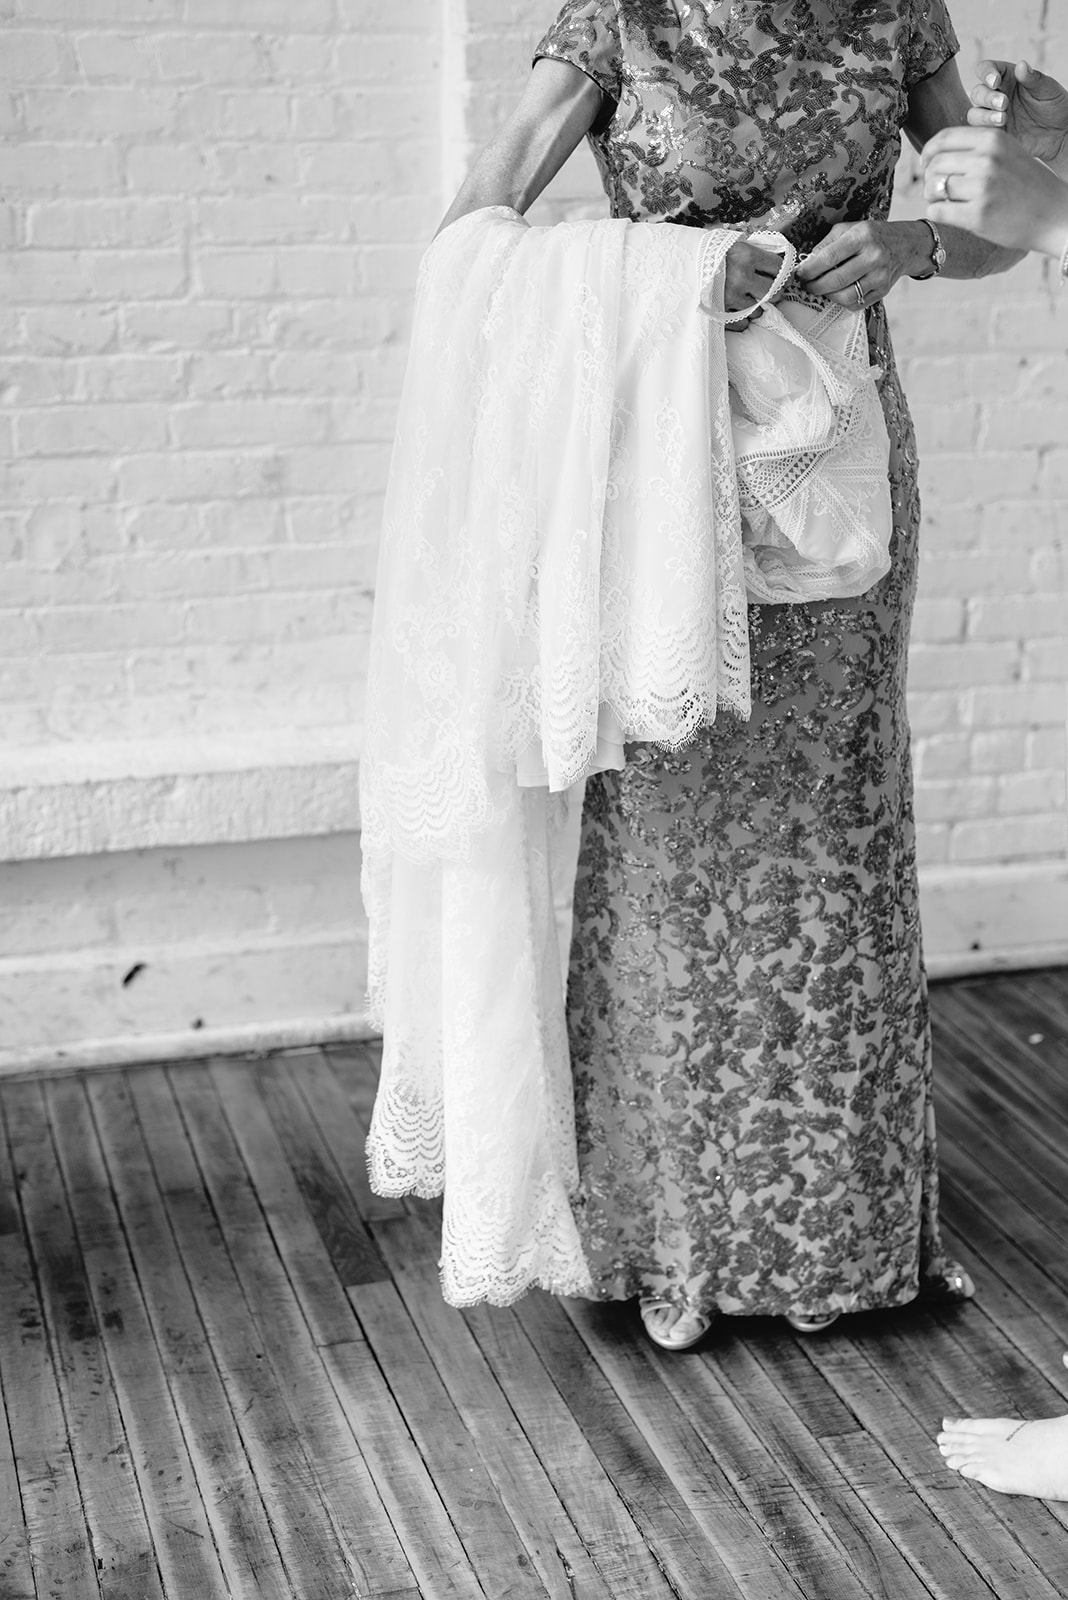 Art Factory Wedding- Industrial Chic- Audrey+Ryan- Paterson NJ- Olivia Christina Photo (13).jpg